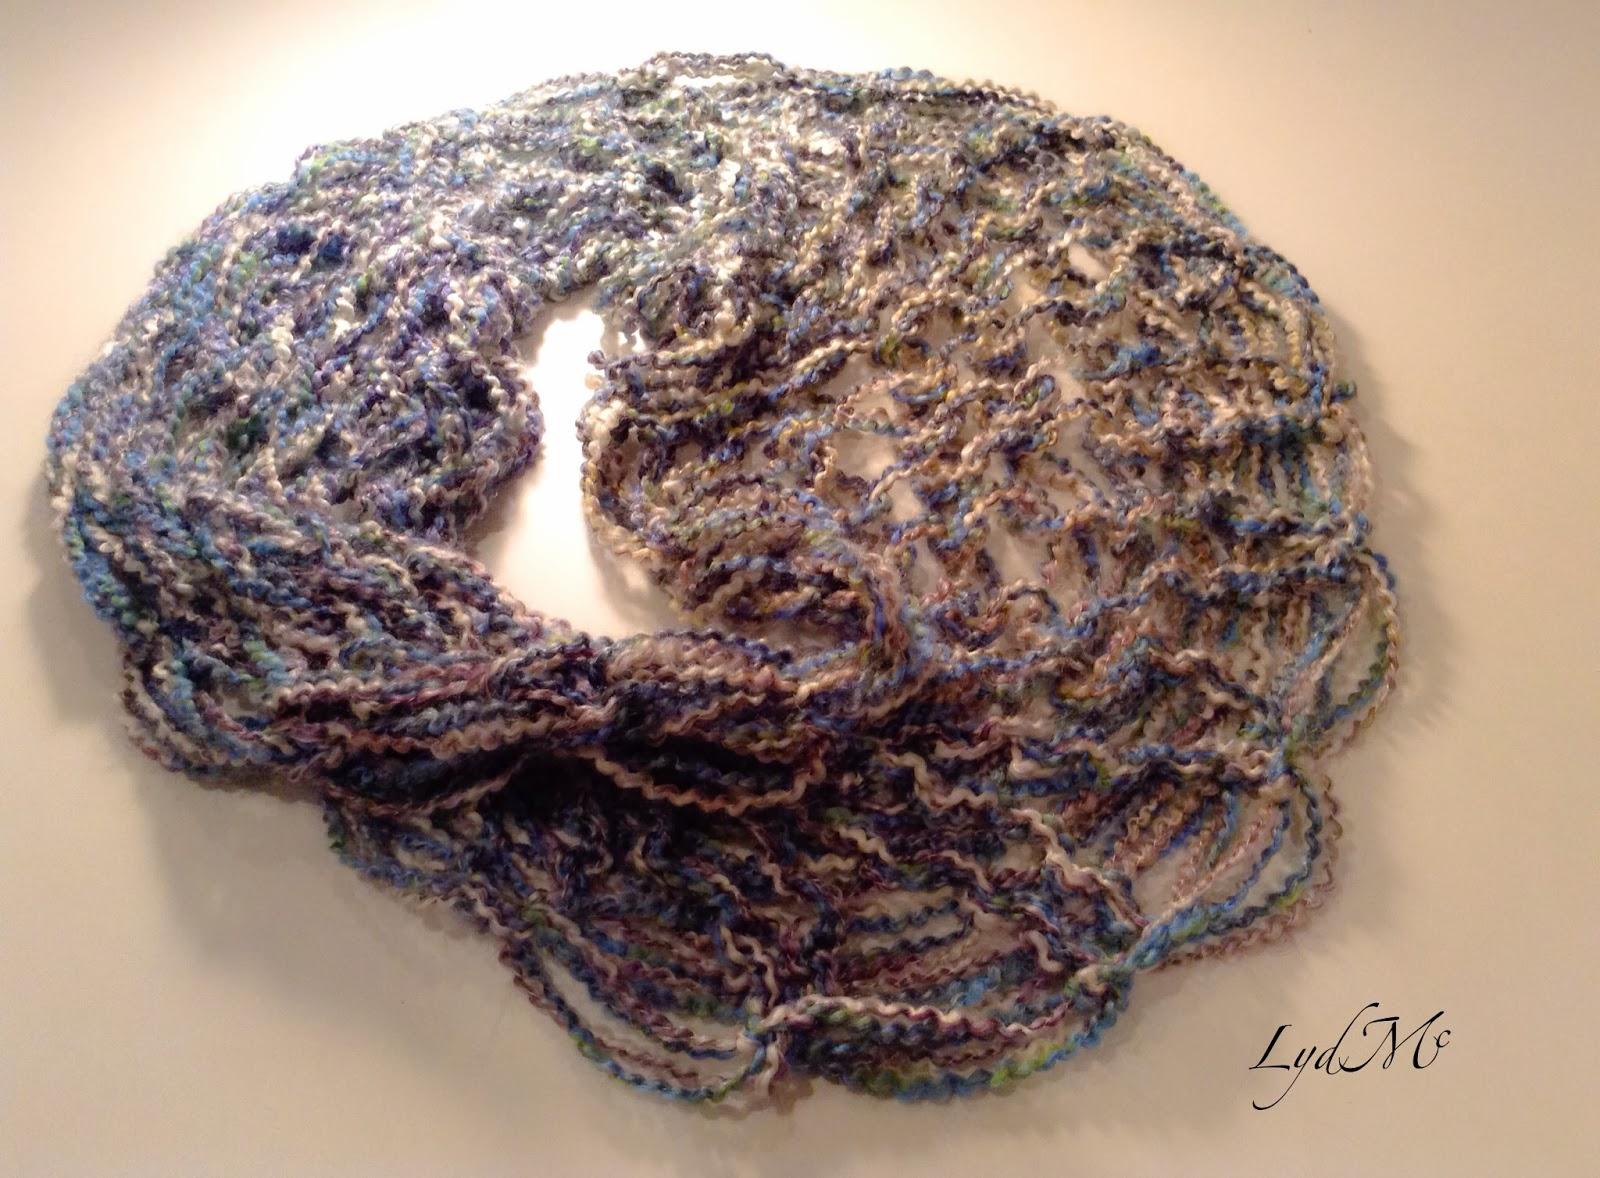 LydMc: Arm Knitting: The Literally Handmade Moebius Scarf